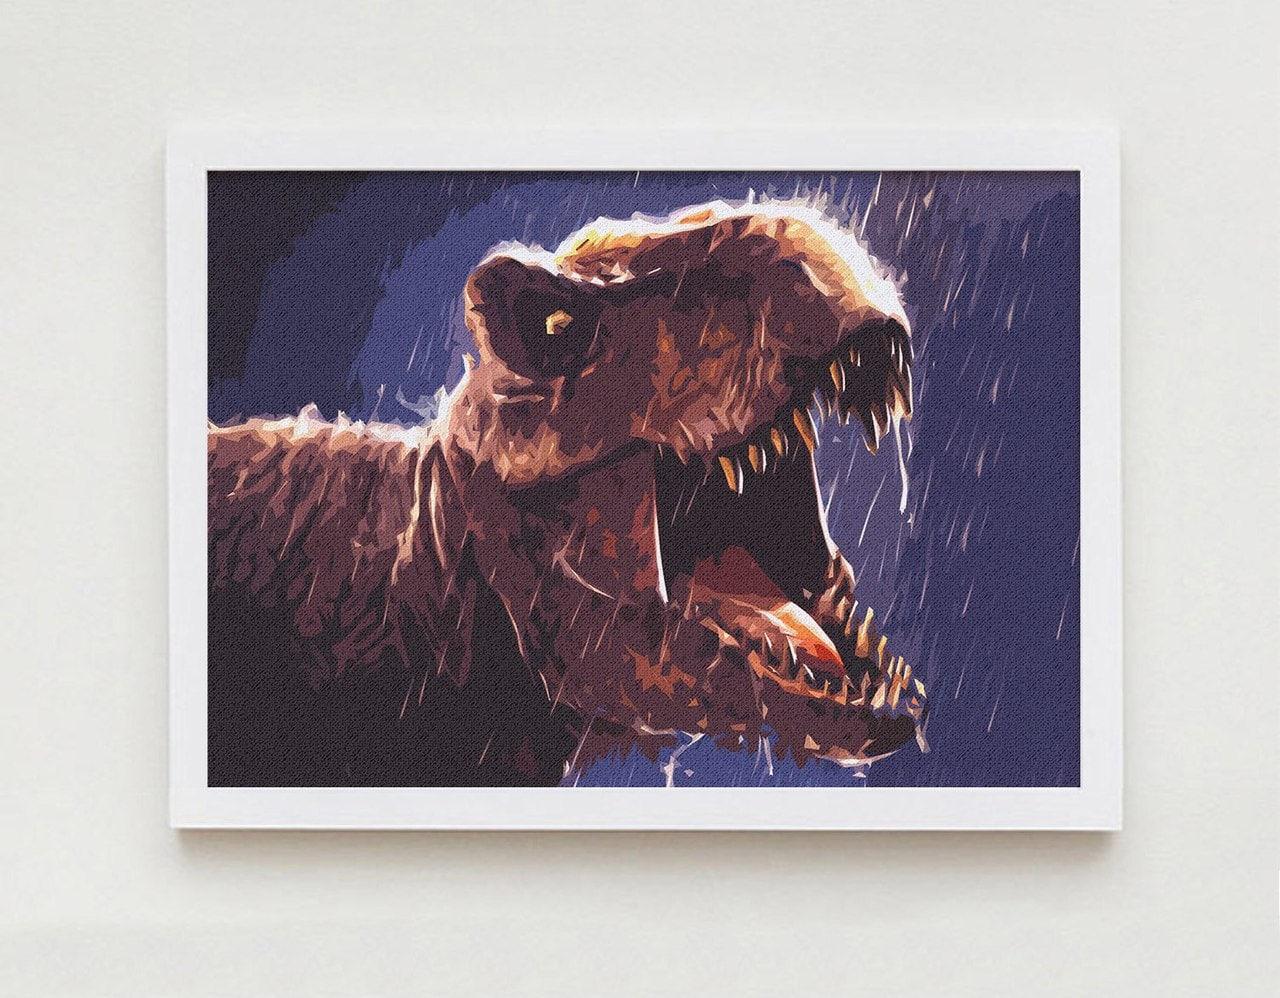 Seeing Jurassic Park in 3D! (With images) | Jurassic park ...  |Jurassic Park Interior Design